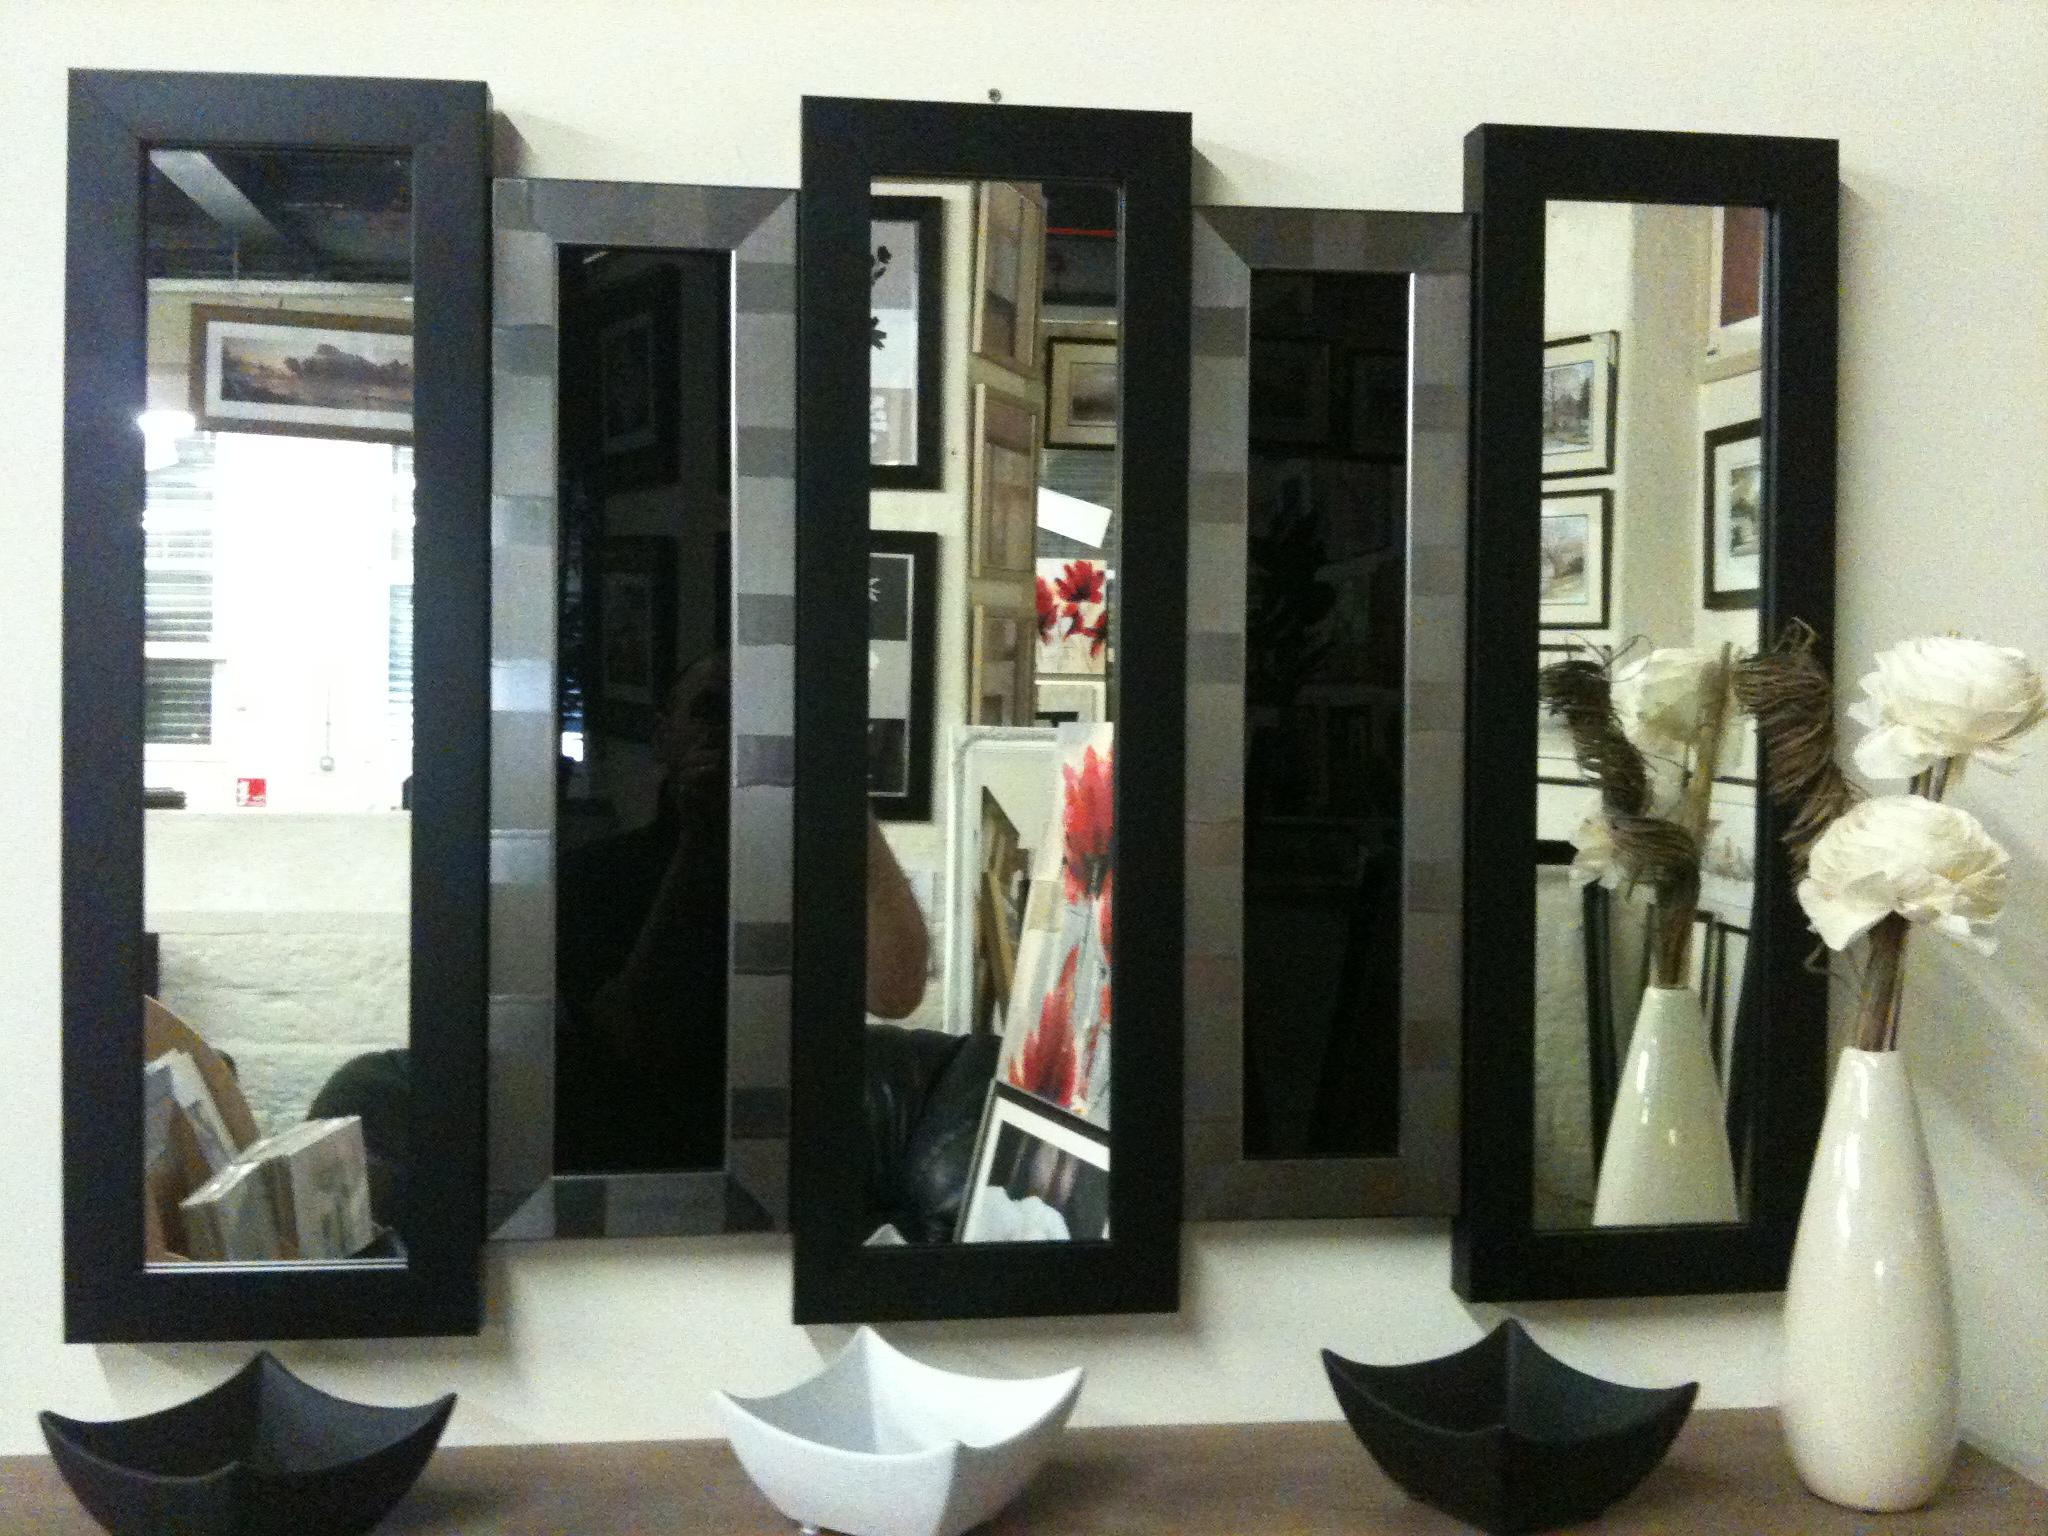 New Black Silver 5 Panel Wall Mirror Glass 105 X 76 Cm